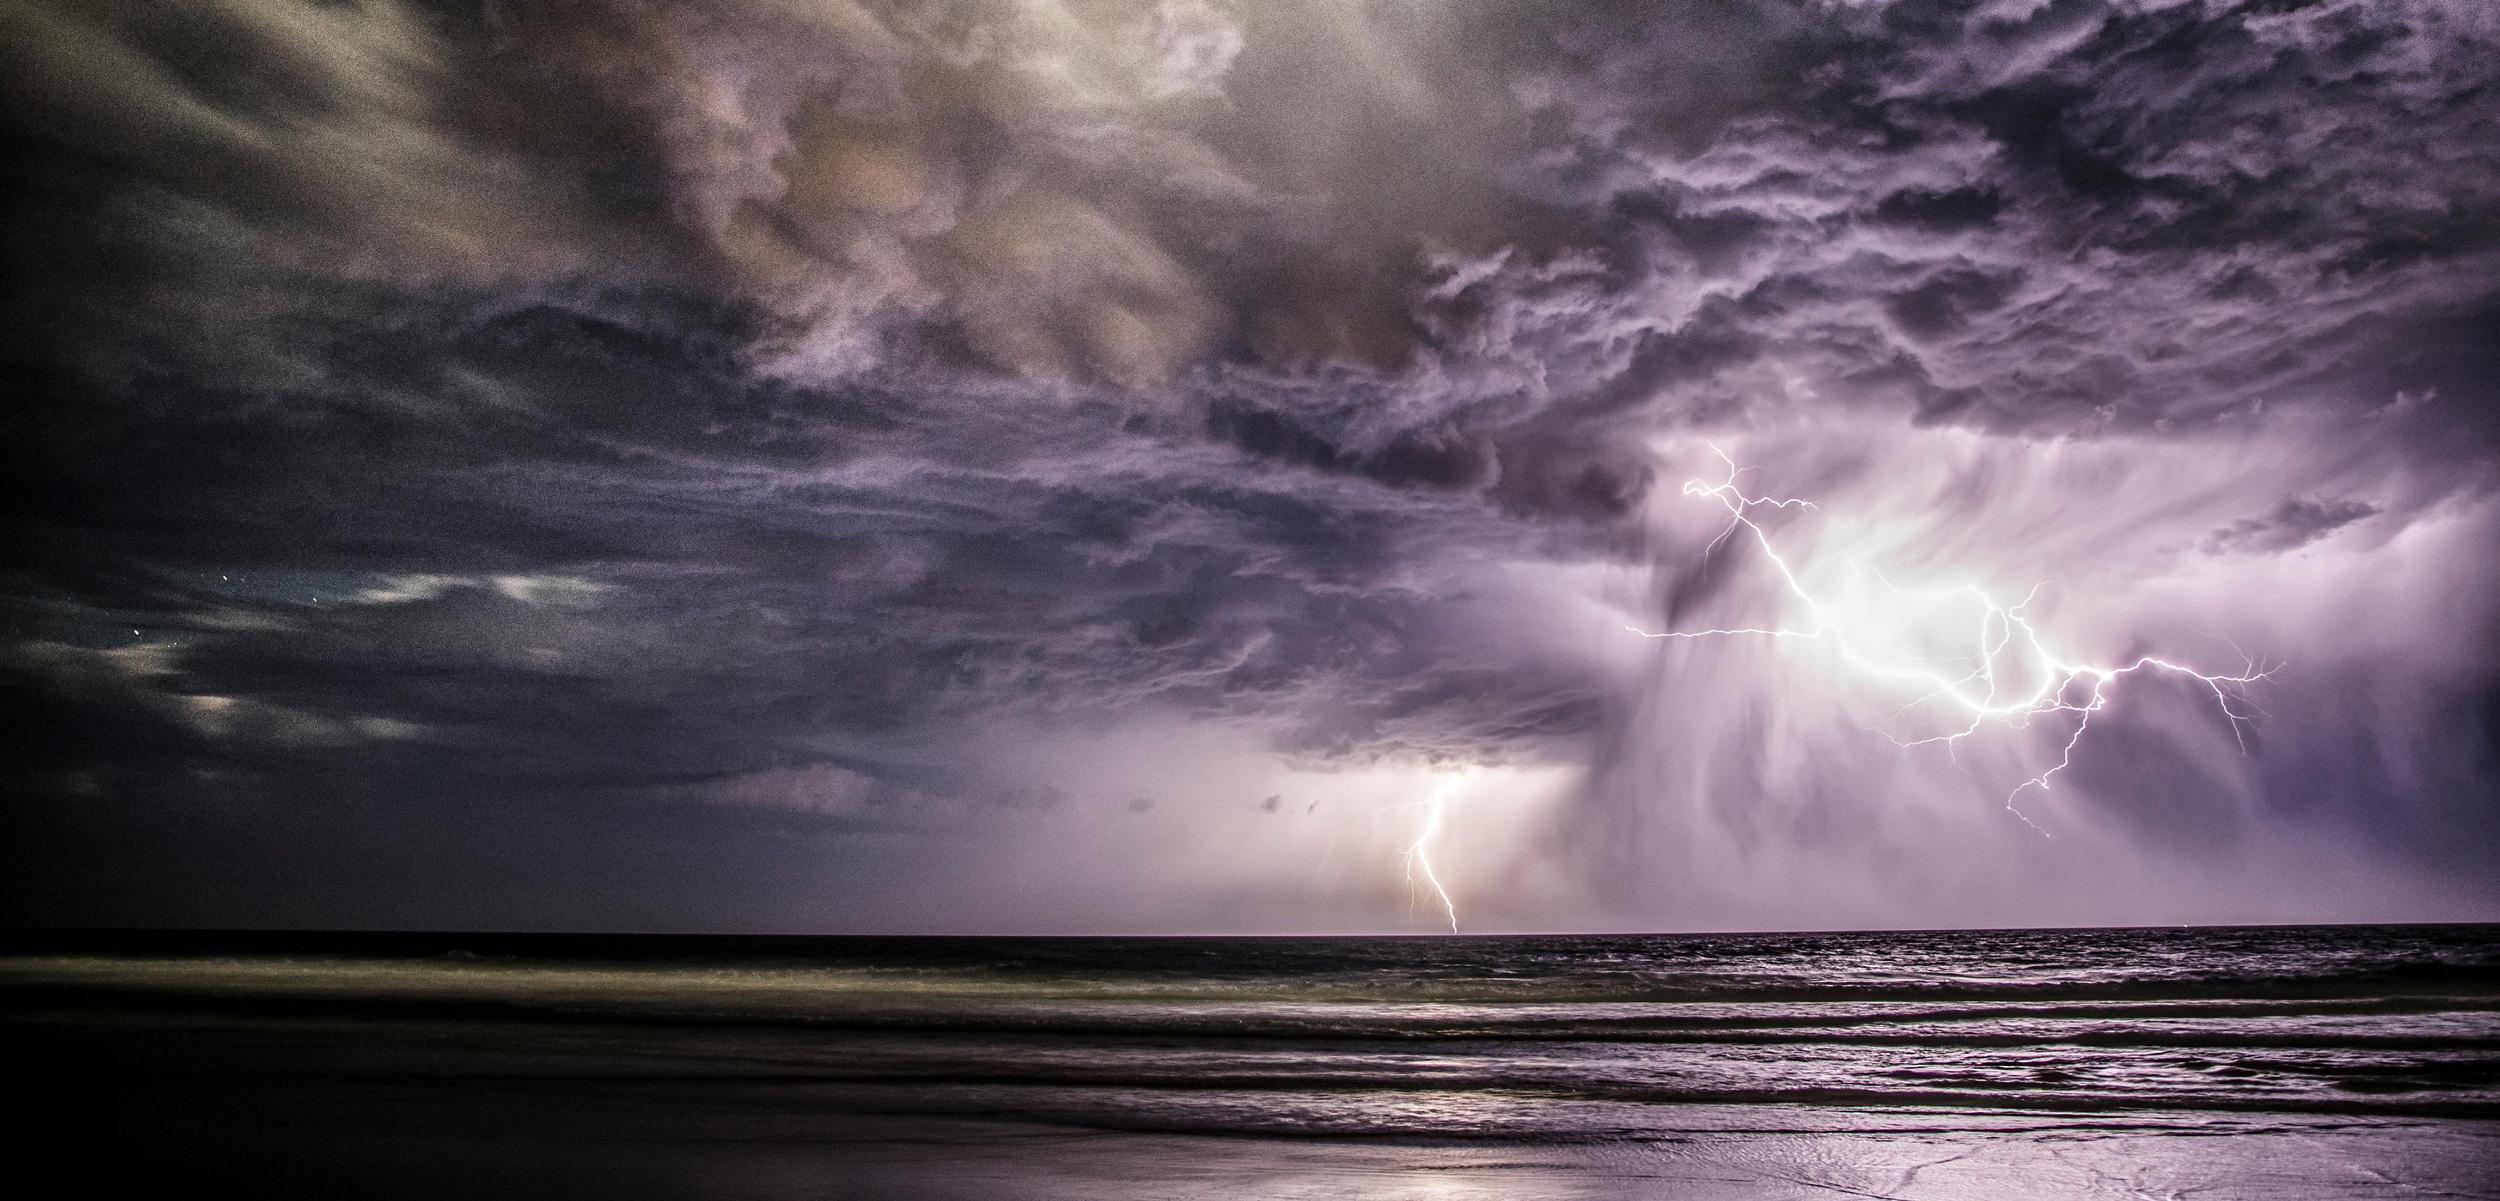 Lightning Storm over ocean